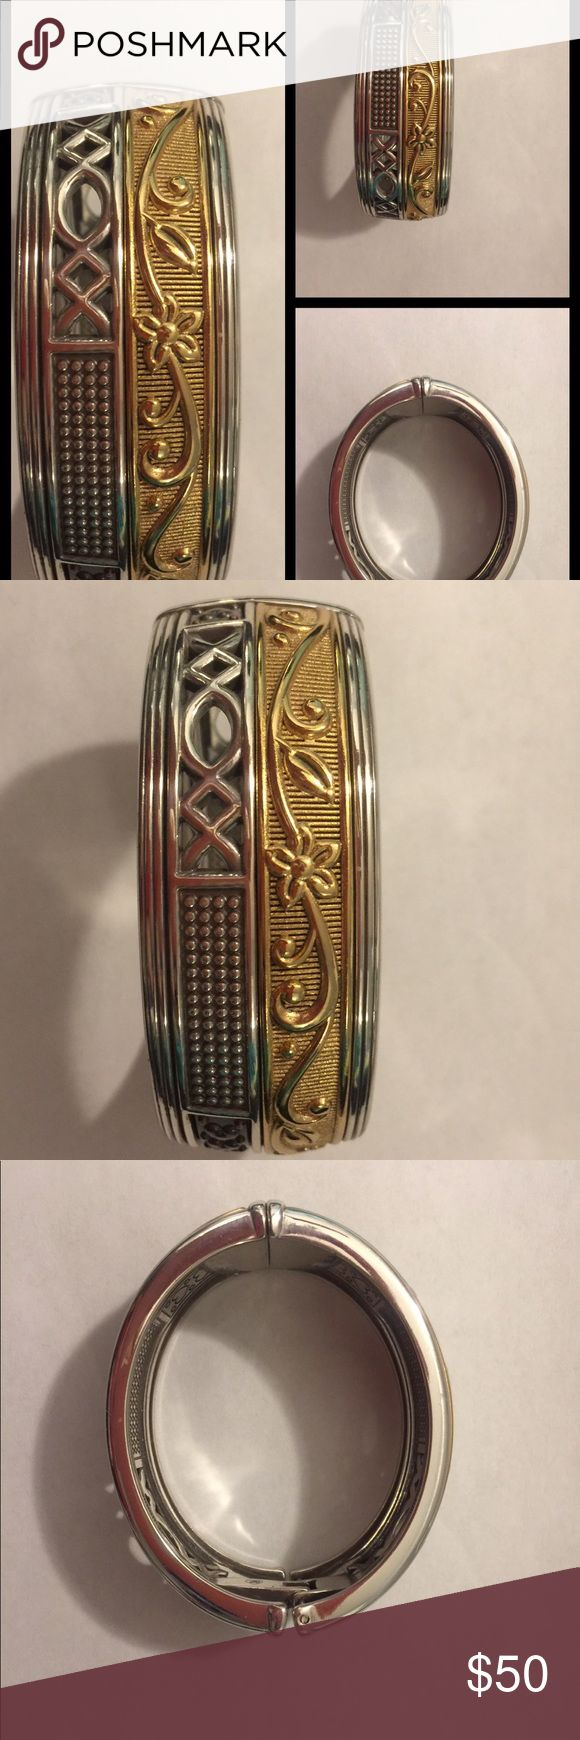 Brighton bracelet bangle Brighten bangle bracelet Brighton Jewelry Bracelets